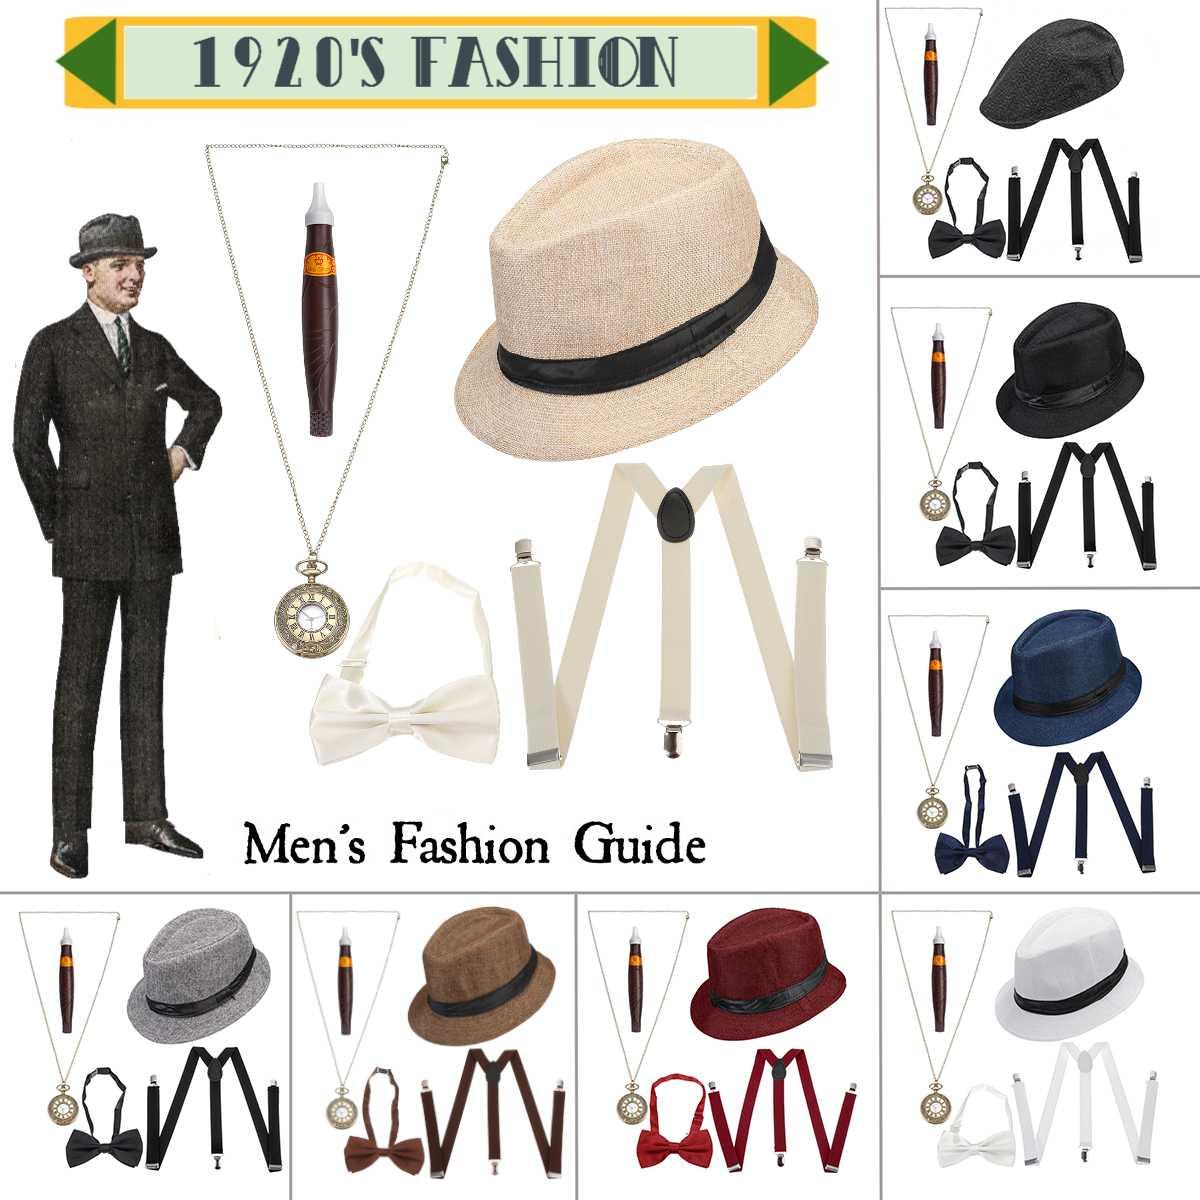 1920s Mens Accessories Costume Accessories Set 5 Pcs/Set Gangster Set Hat Suspenders Bow Tie Pocket Watch Cigar